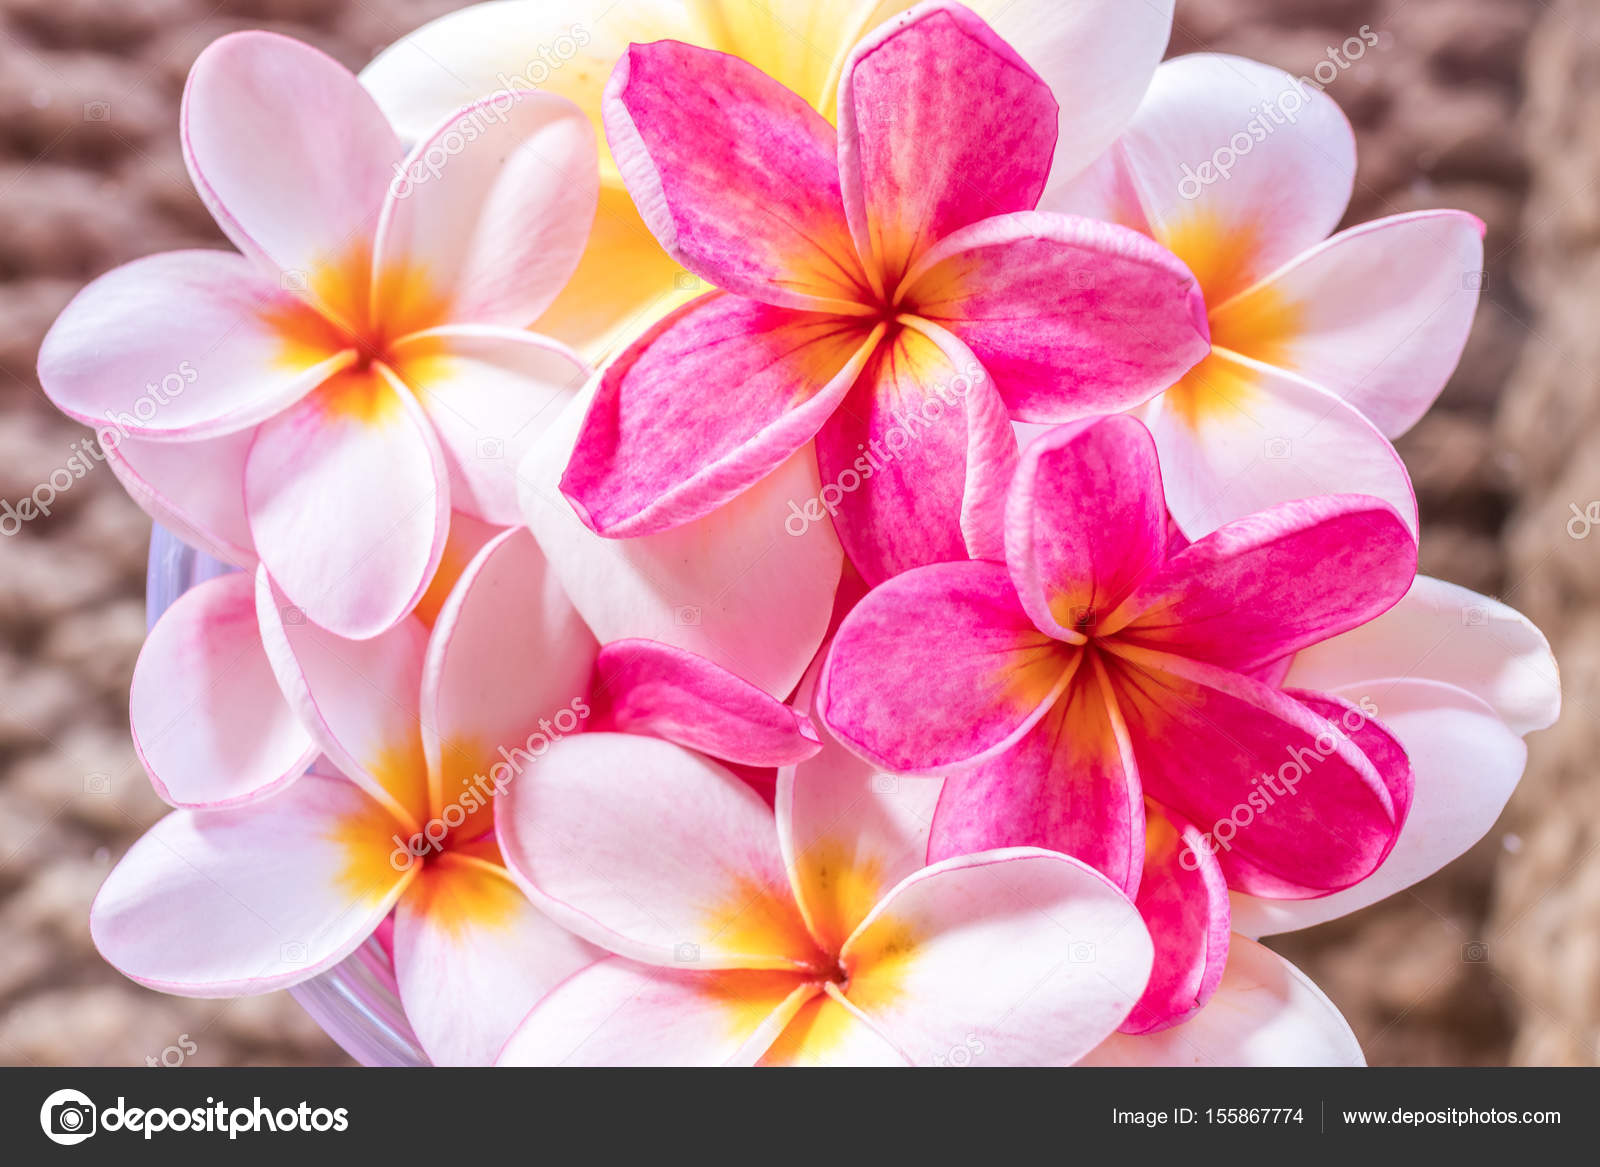 Plumeria flower pink and white frangipani tropical flower plumeria plumeria flower pink and white frangipani tropical flower plumeria flower bloominge spa flower mightylinksfo